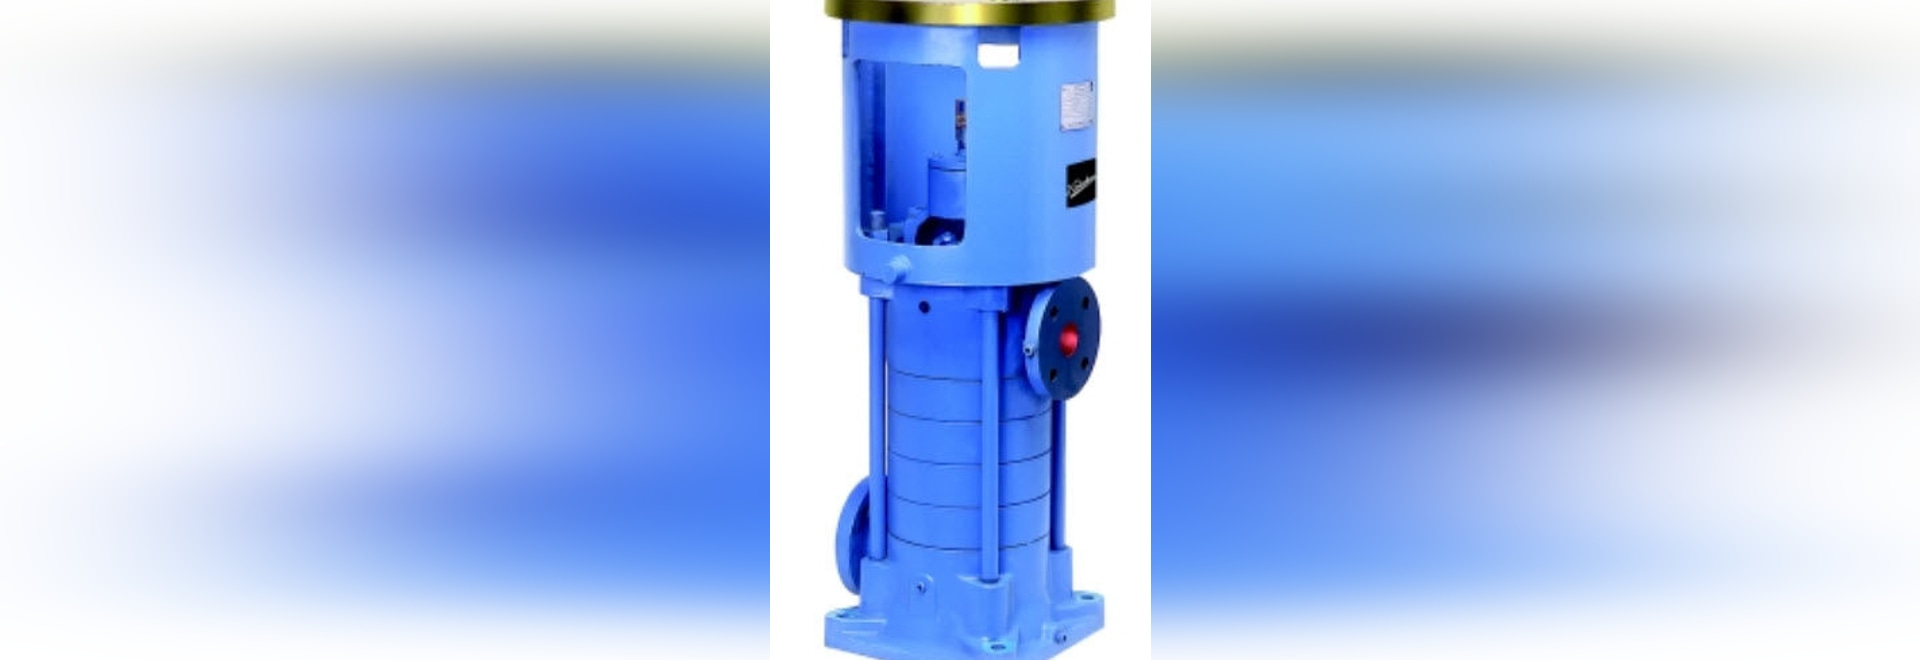 NEW: centrifugal pump by Kirloskar